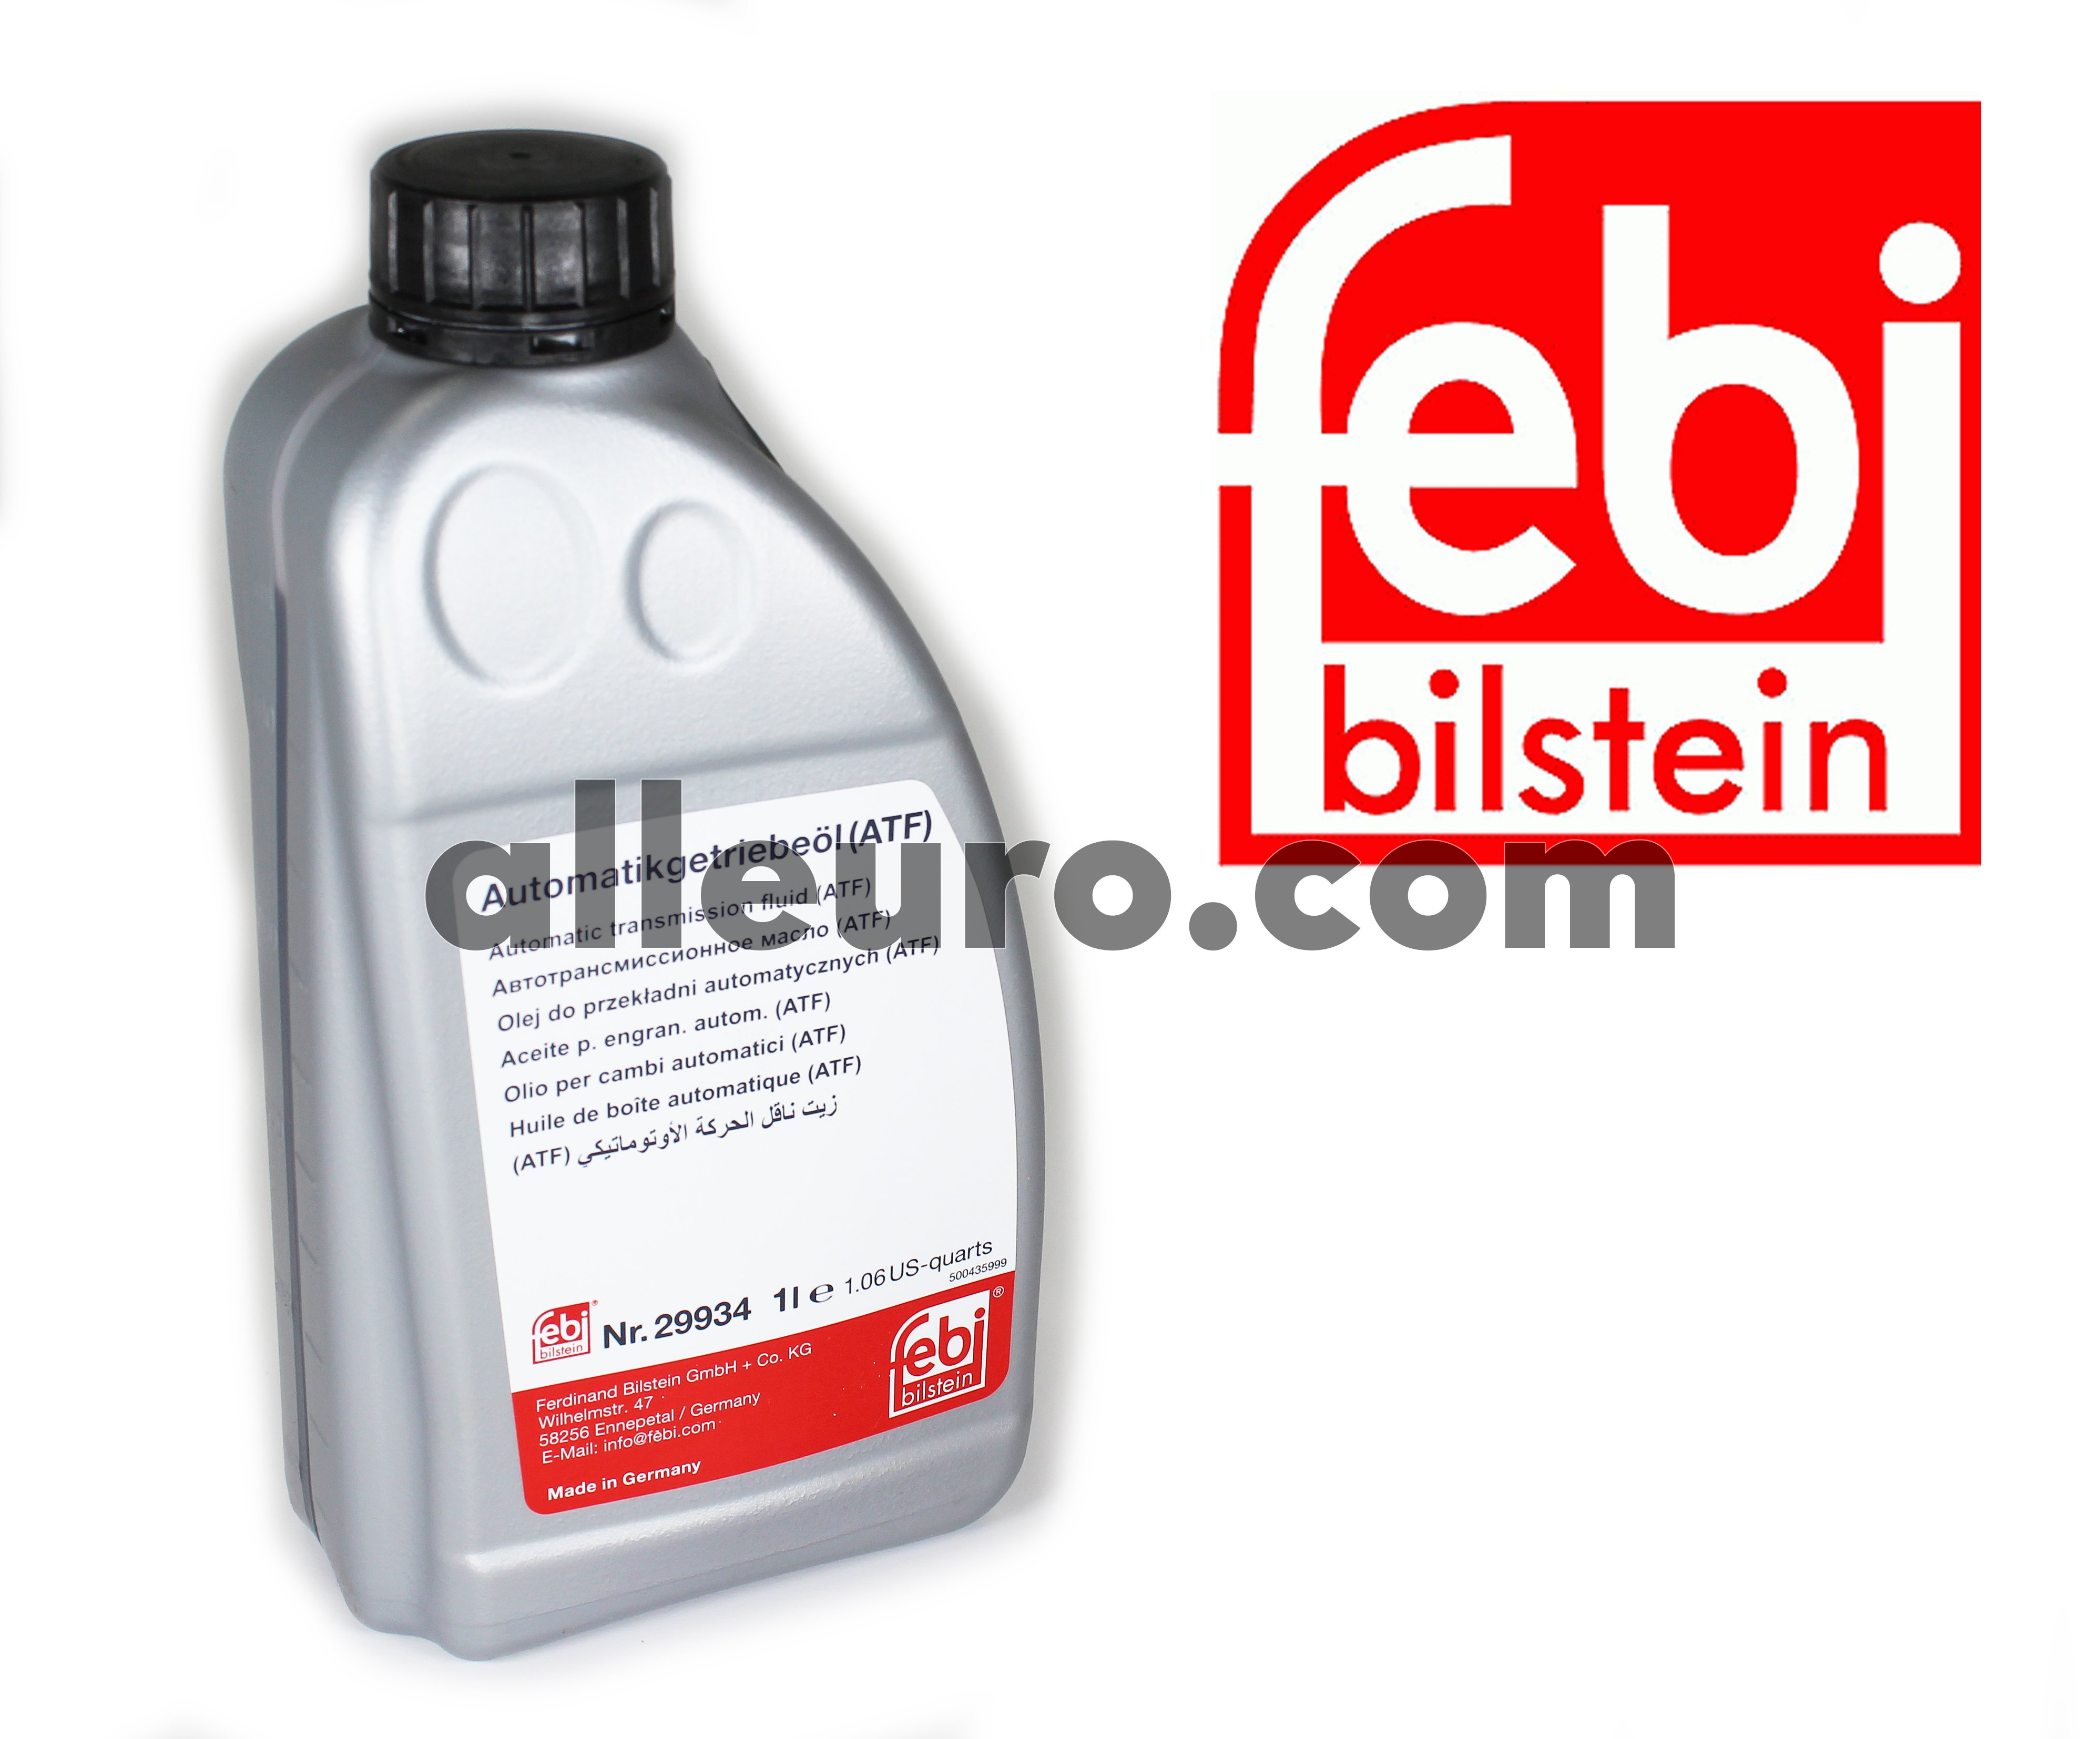 Febi Bilstein Automatic Transmission Fluid 1 Liter 29934 29934